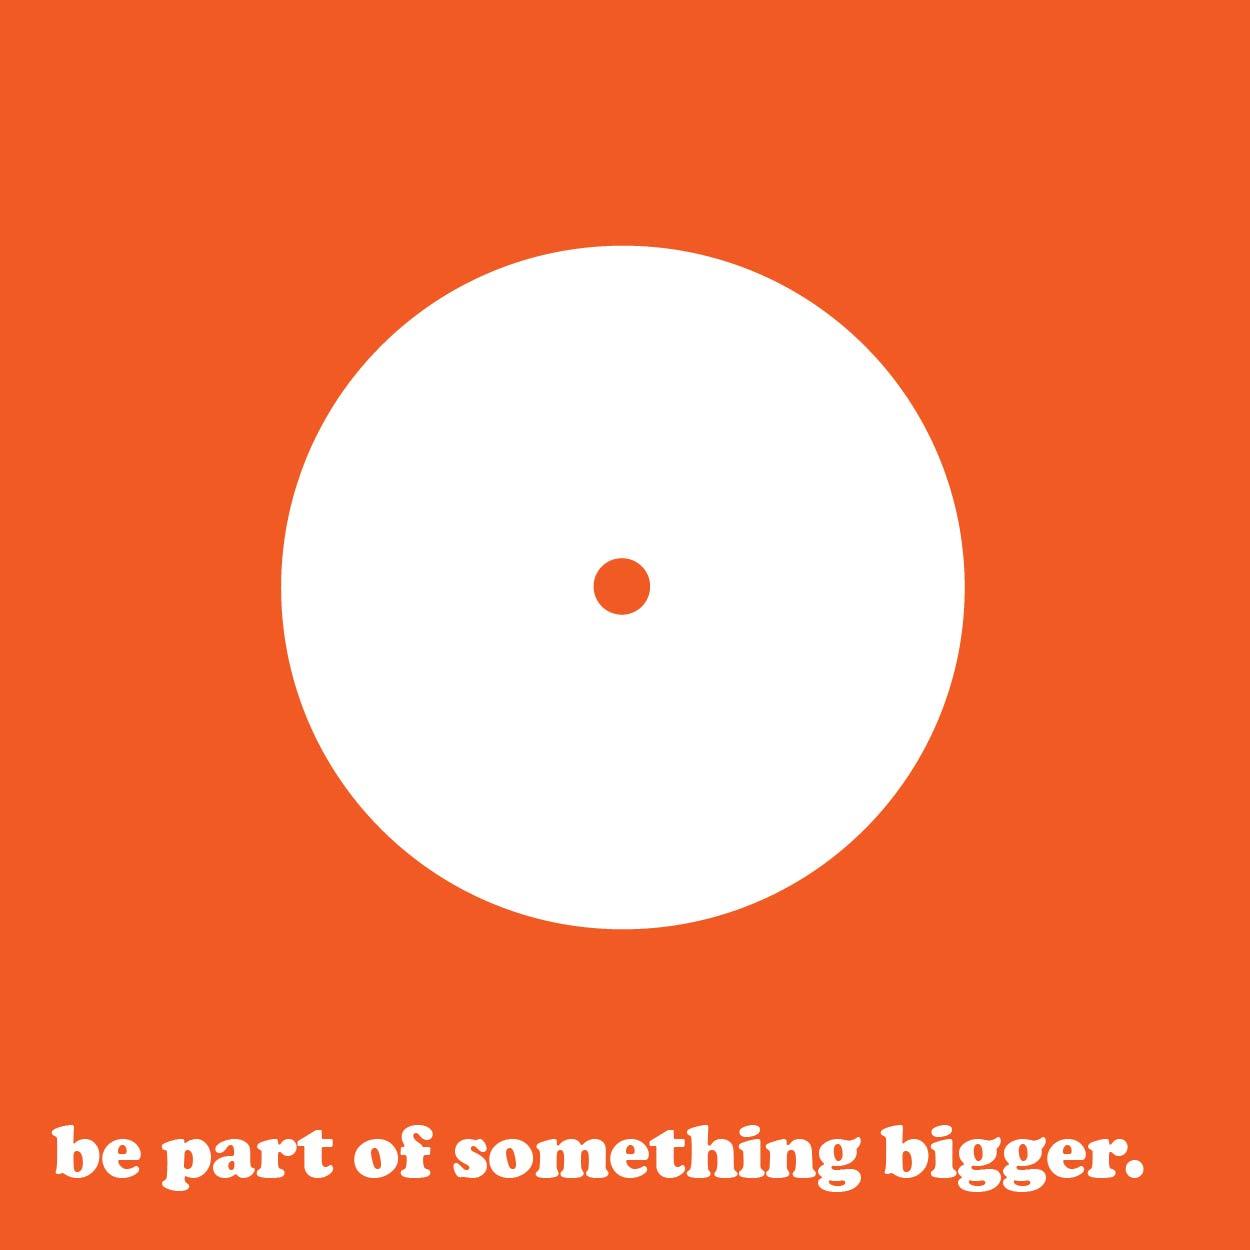 be part of something bigger